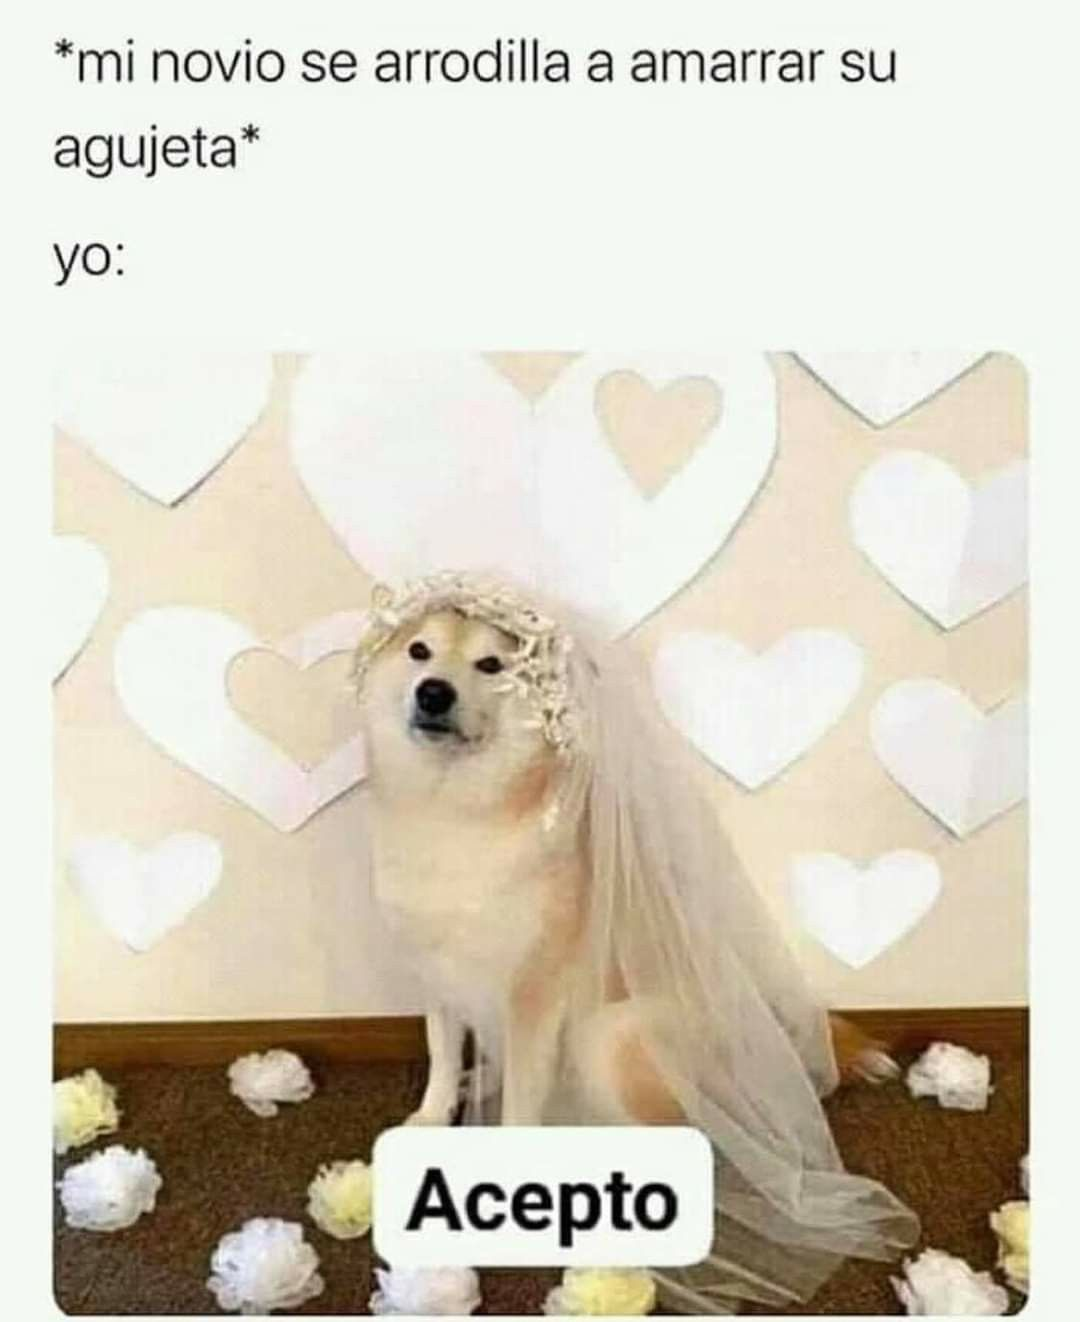 Pin De Alejandro Mendez En Memes En Espanol Memes Divertidos Memes Buenisimos Memes